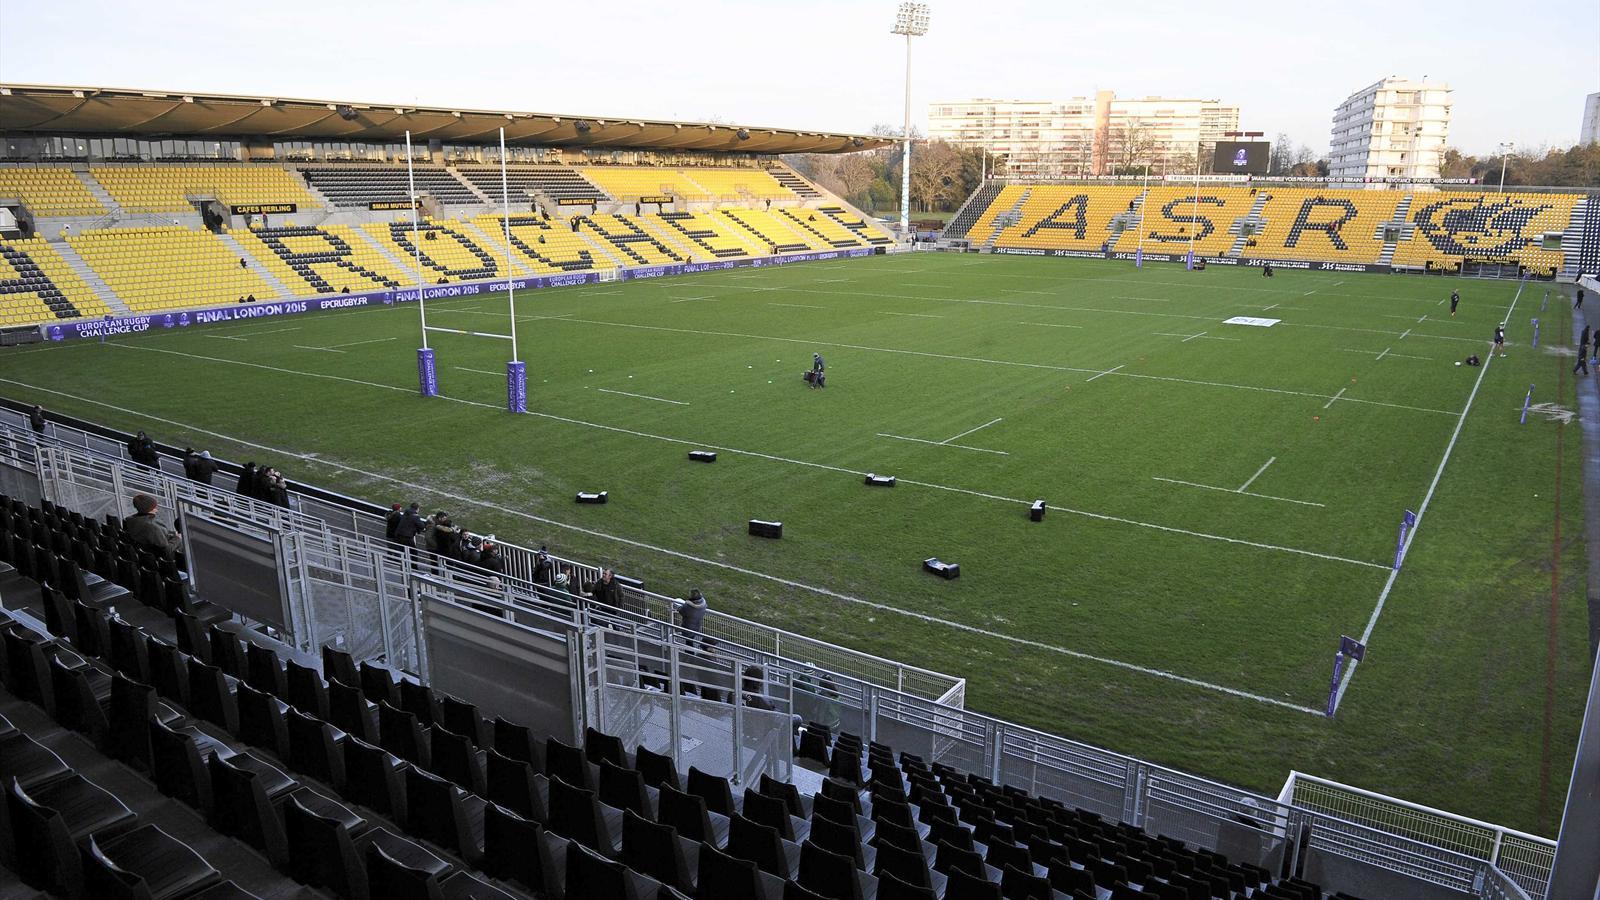 Live la rochelle stade fran ais top 14 18 february - University league tables french ...